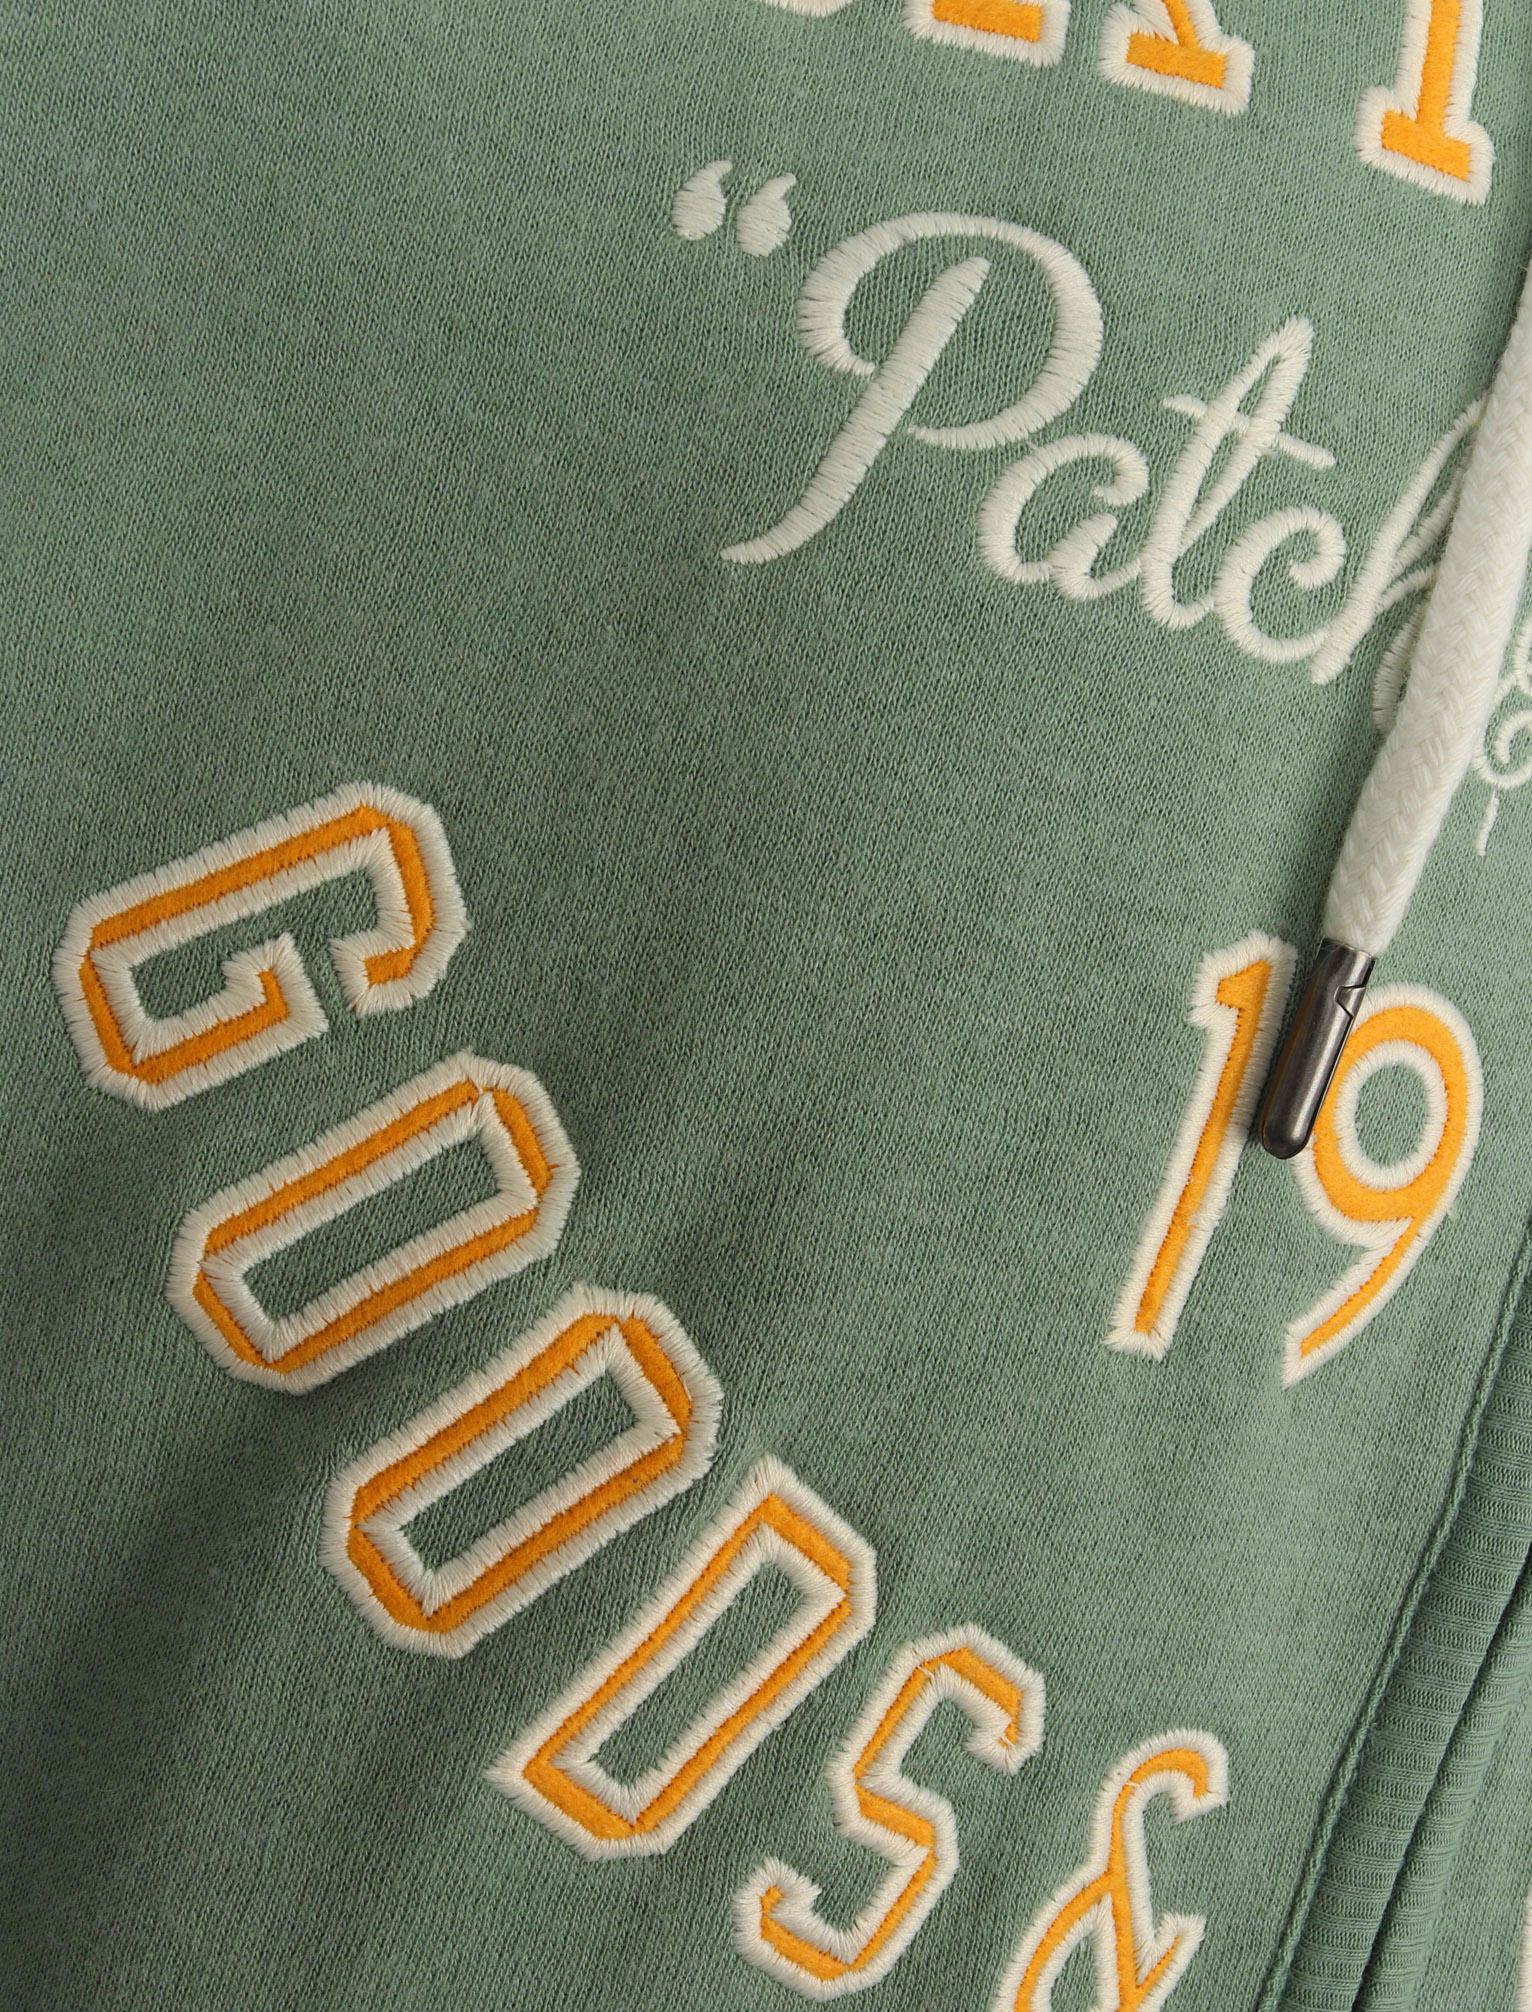 Tokyo-Laundry-Men-039-s-Harper-Zip-Up-Hoodie-Hooded-Top-Sweatshirt-Sweater-Jacket thumbnail 13